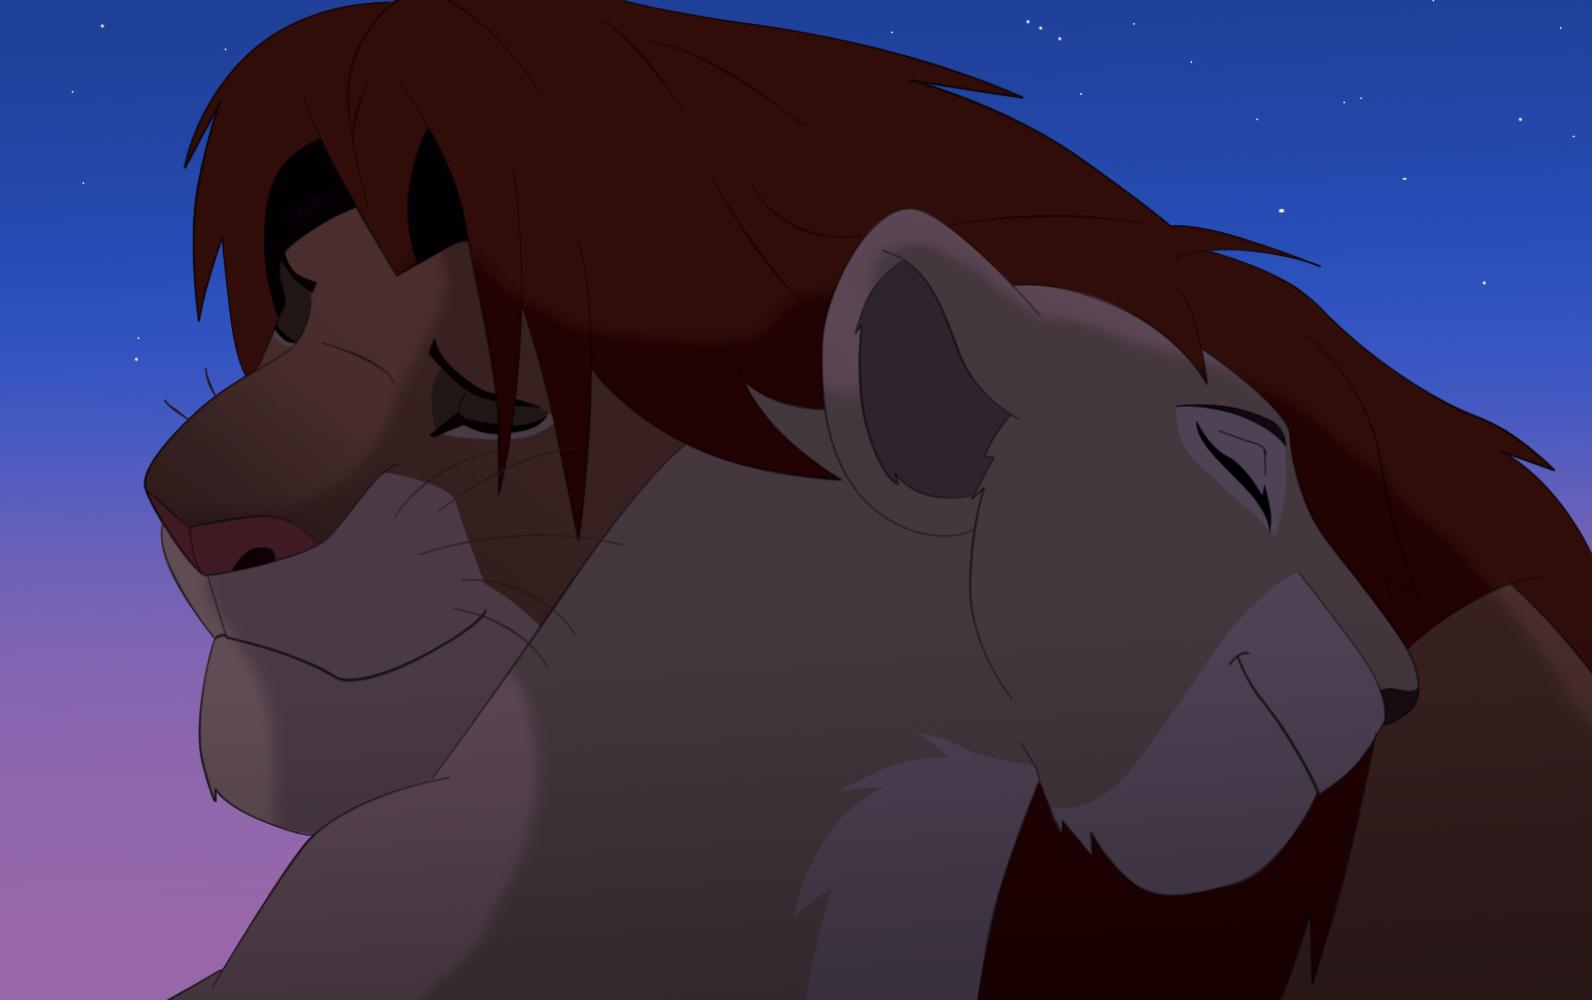 Simba and Nala by All0412 on DeviantArt